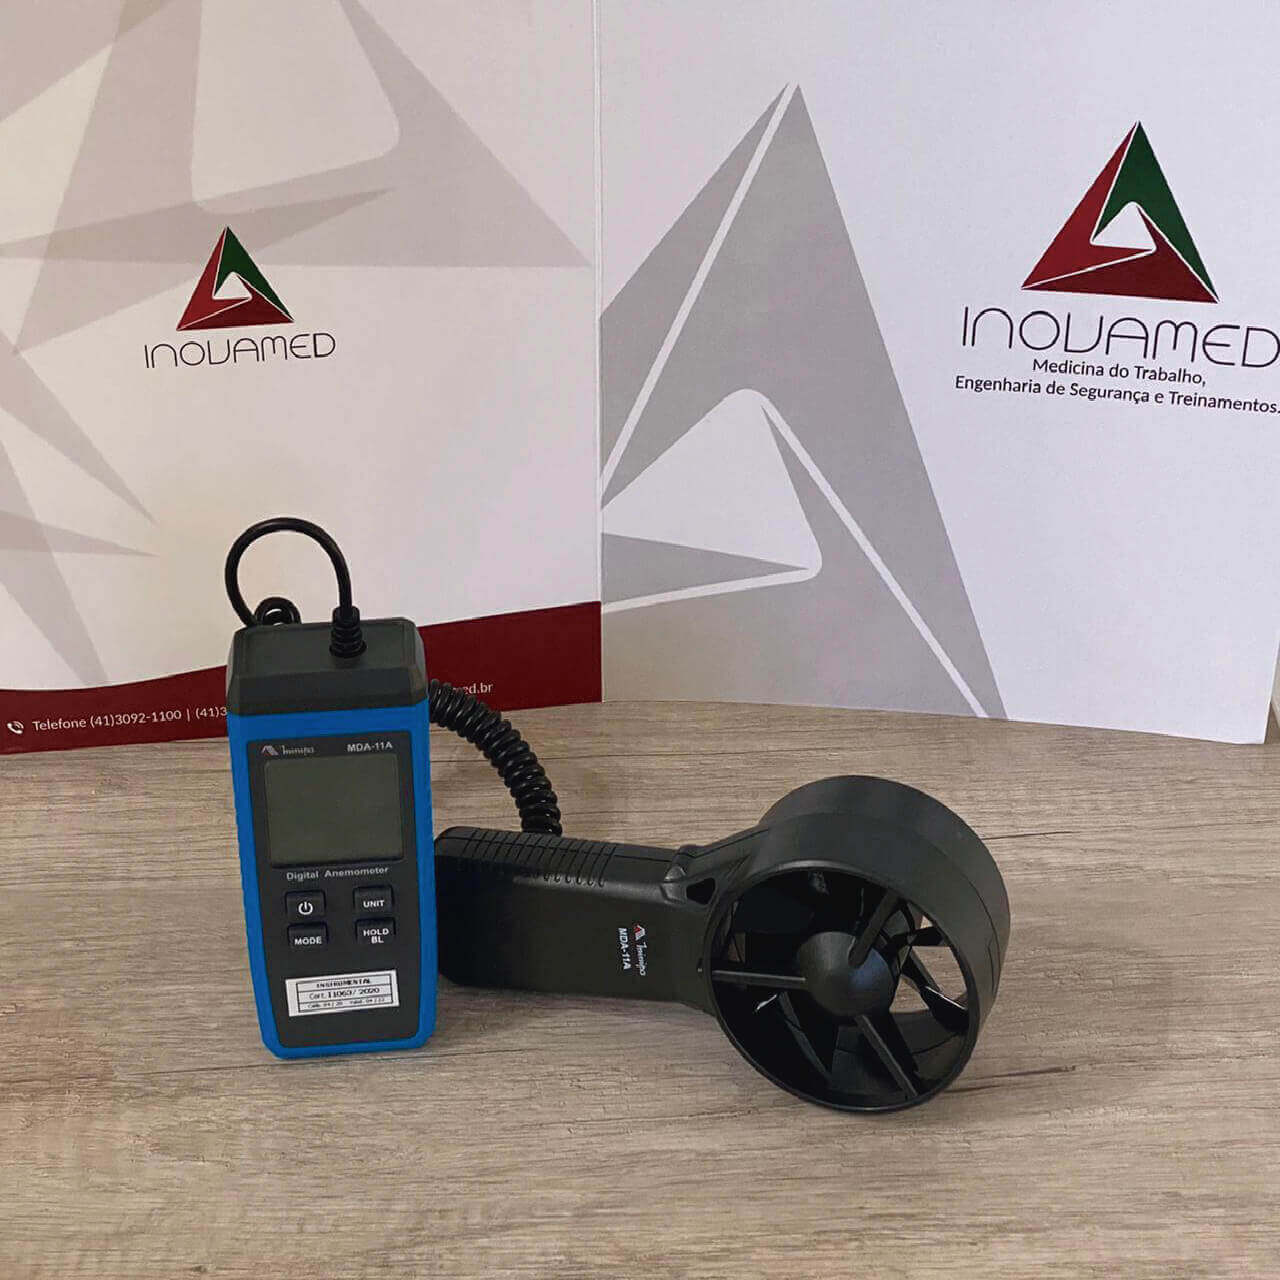 Imagem do Produto-Anemômetro Minipa MDA-11A